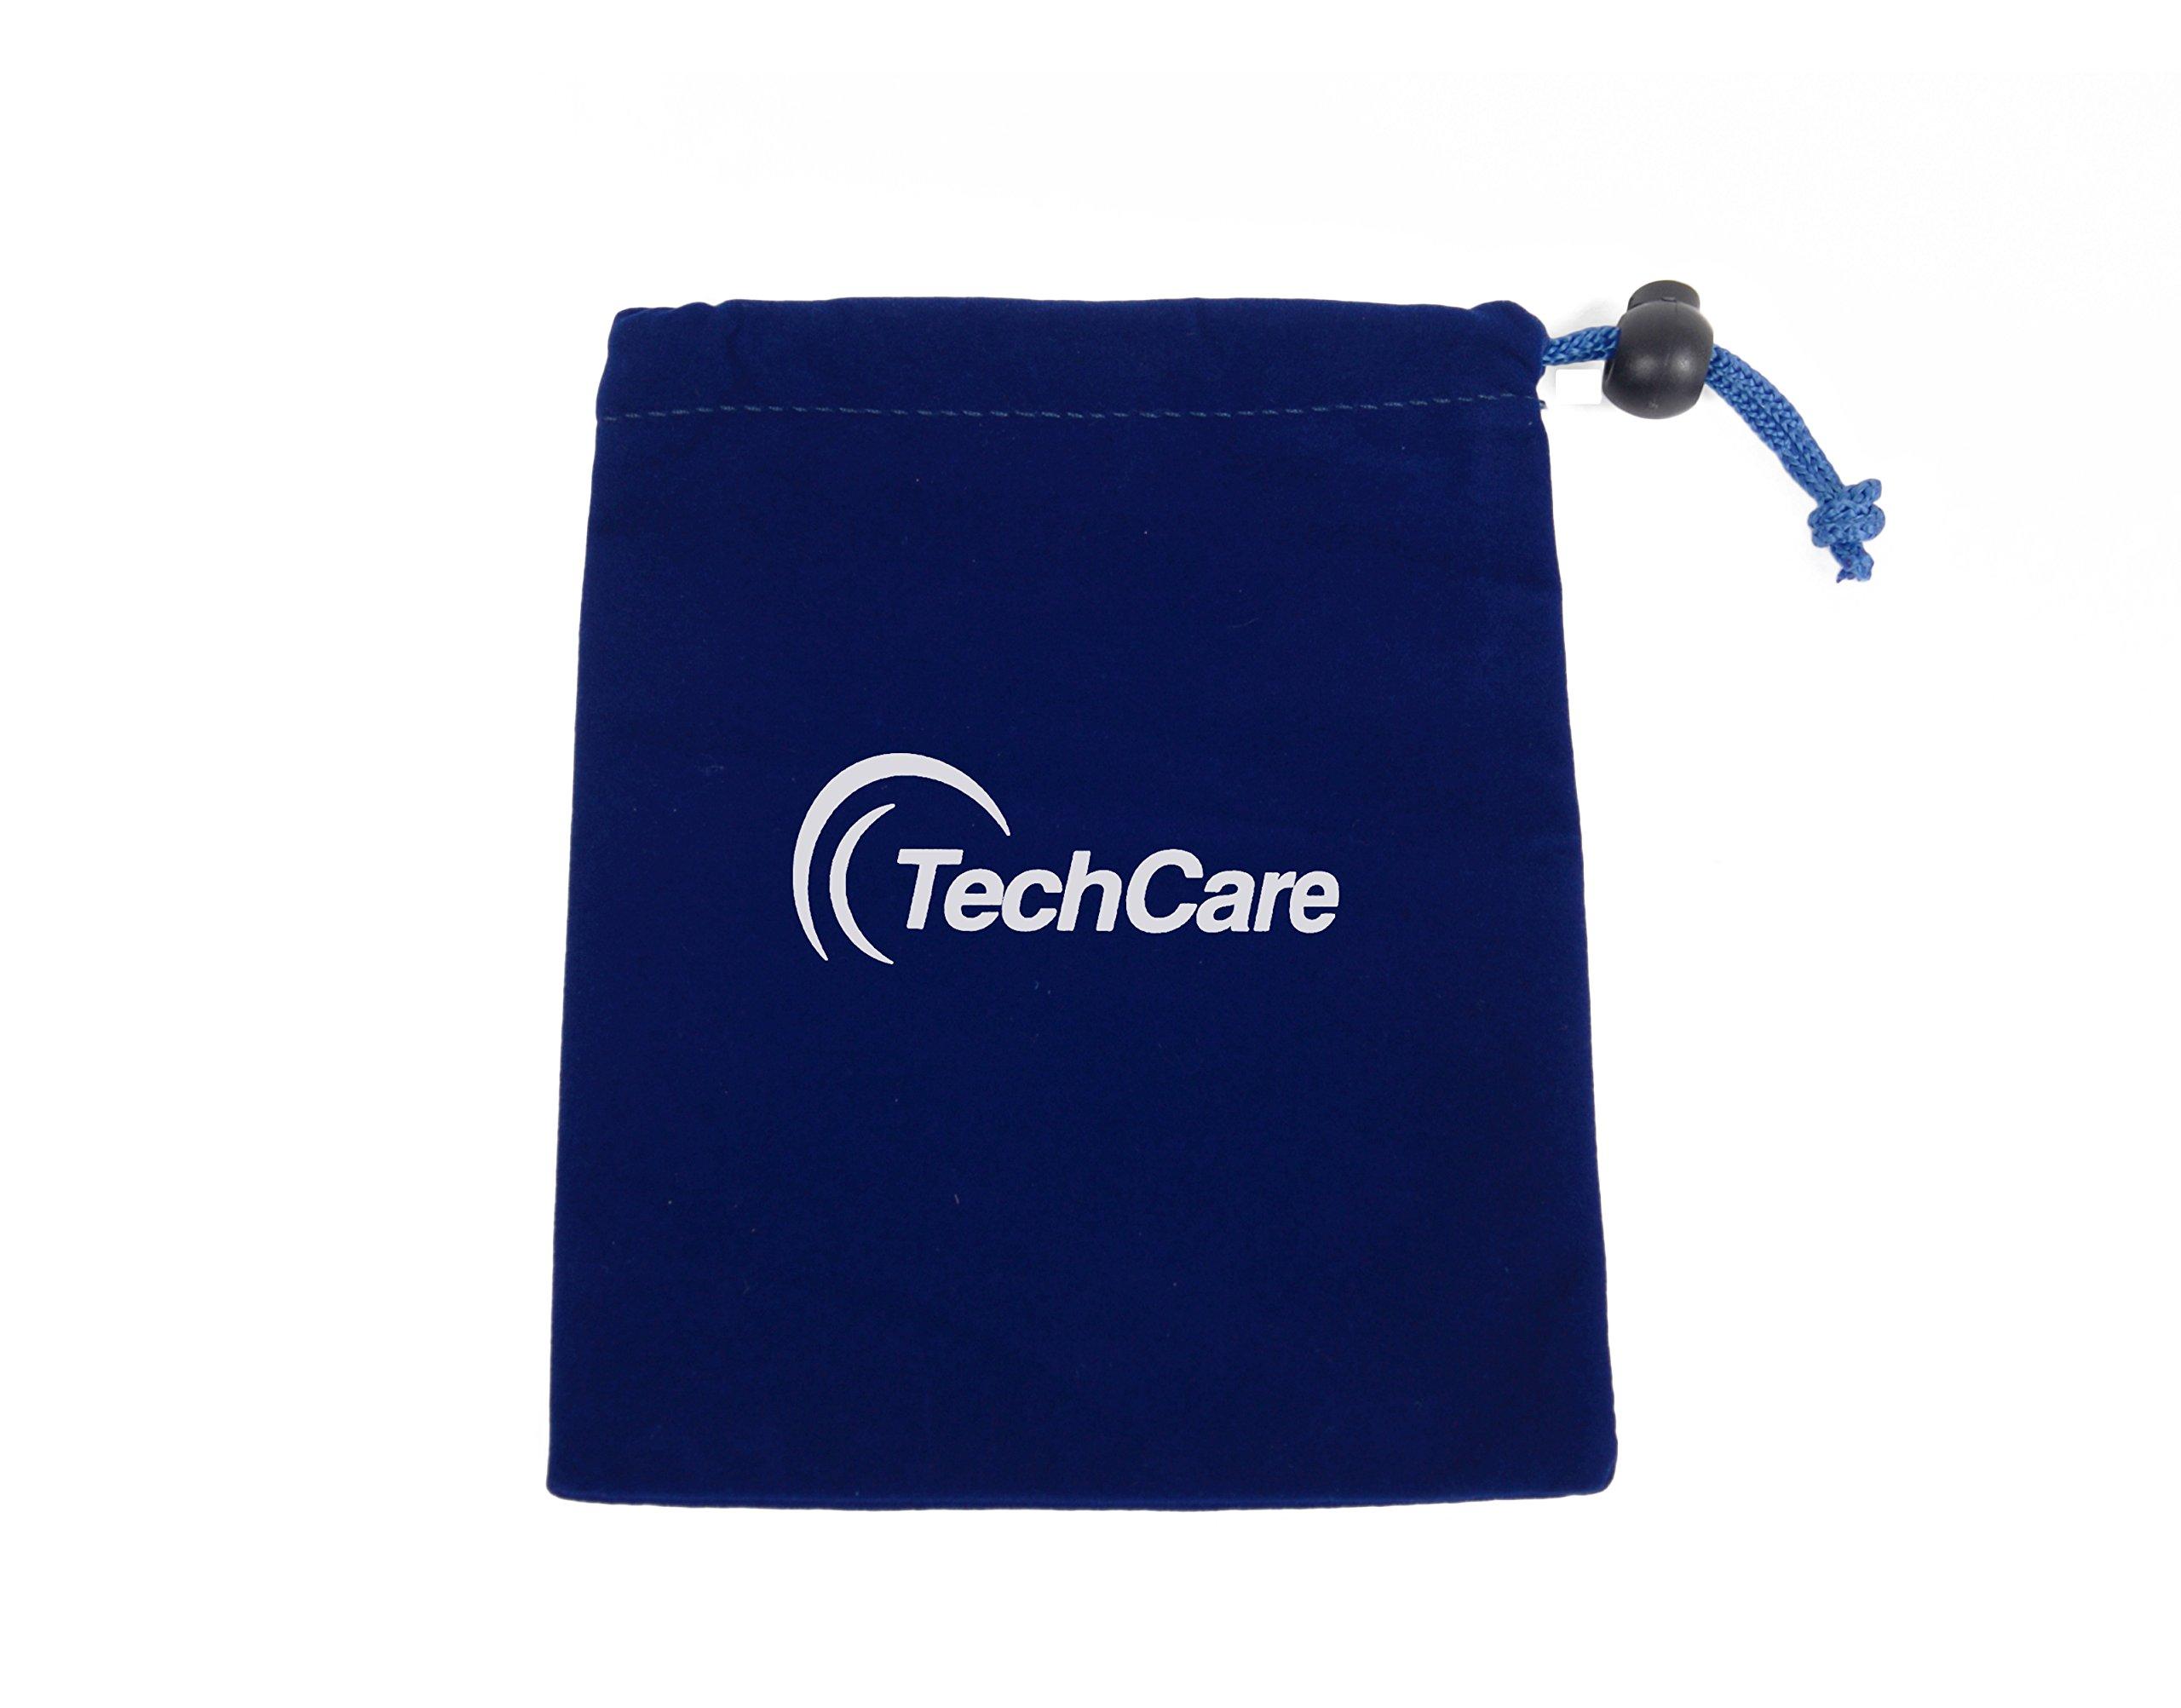 TechCare Pro TENS Unit 24 Modes Best Portable Massager FDA cleared 510K Back Neck Stress Sciatic Pain, Handheld Full Body Palm Plus Digital Pulse Impulse Professional Micro Massager (Black)